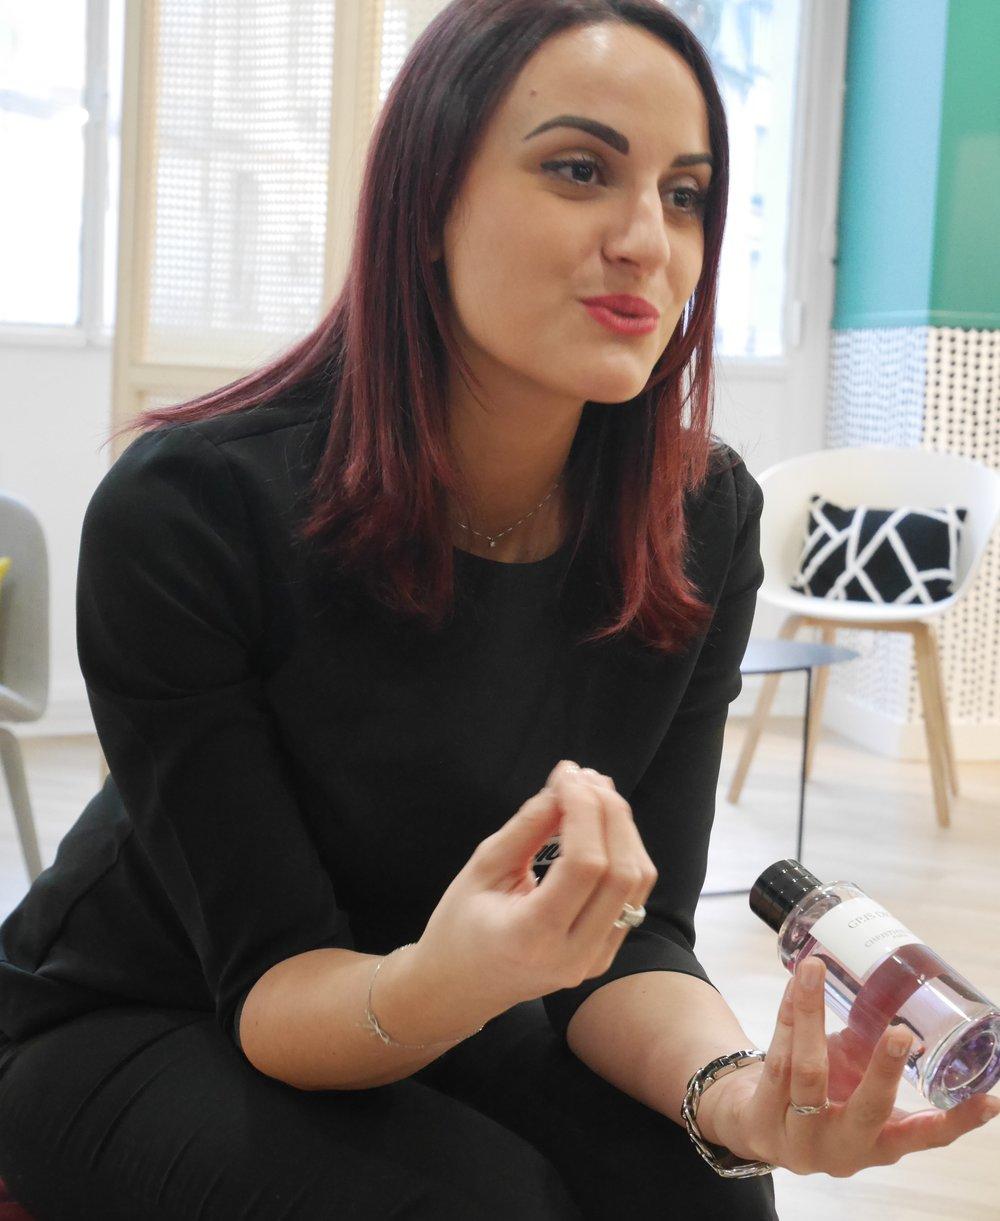 Atelier-olfactif-tea-time-Dior-BHV-elisa-les-bons-tuyaux.jpg